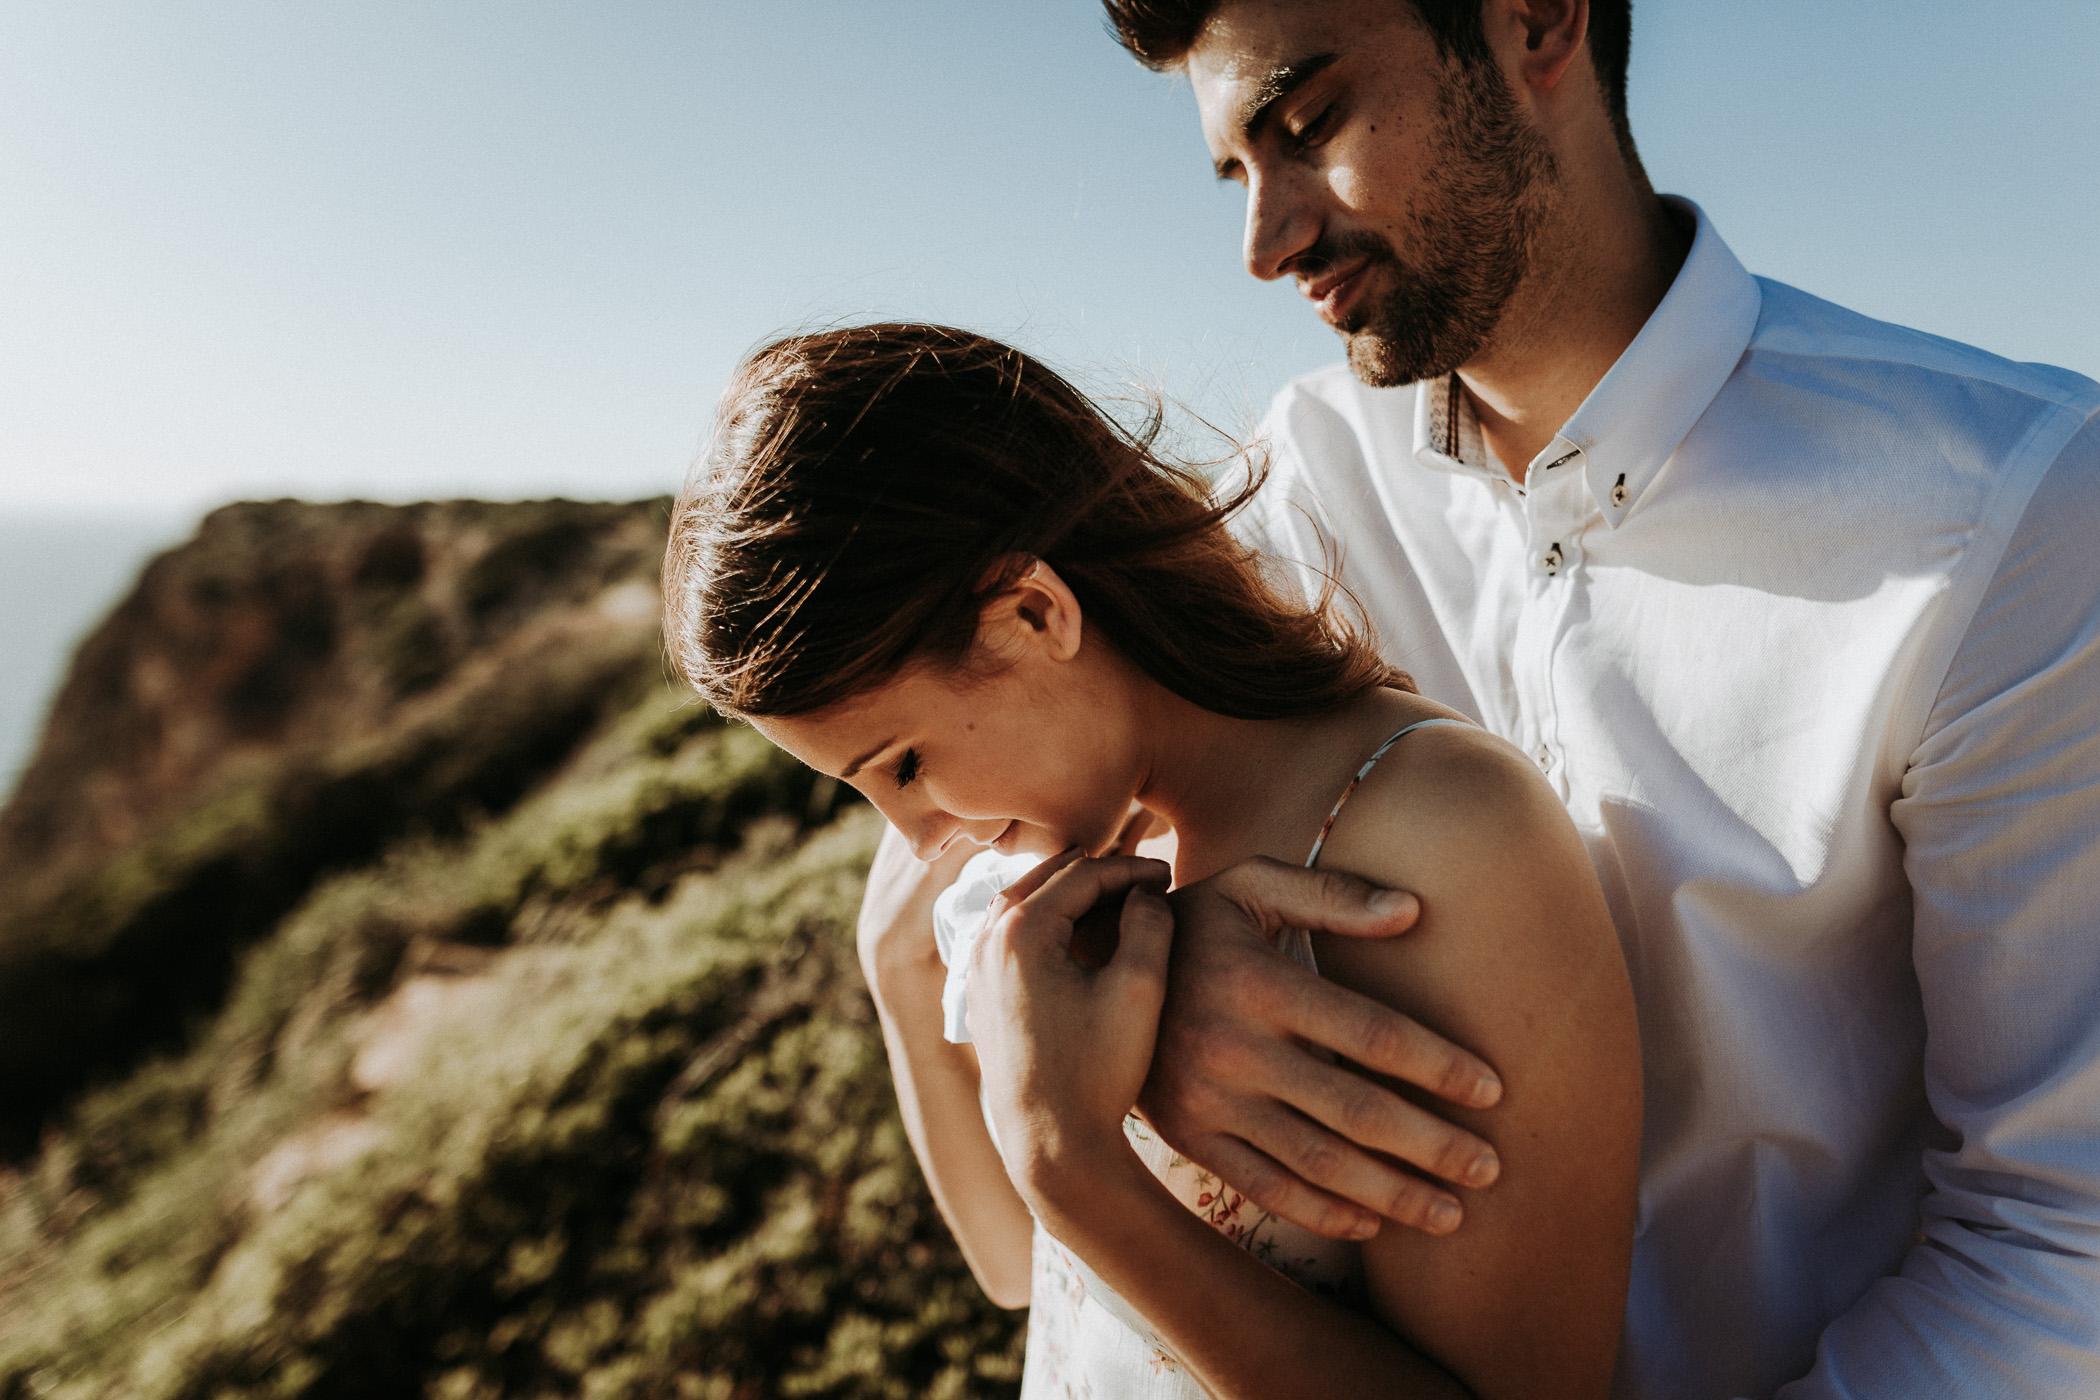 DanielaMarquardtPhotography_wedding_elopement_mallorca_spain_calapi_palma_lauraandtoni_195